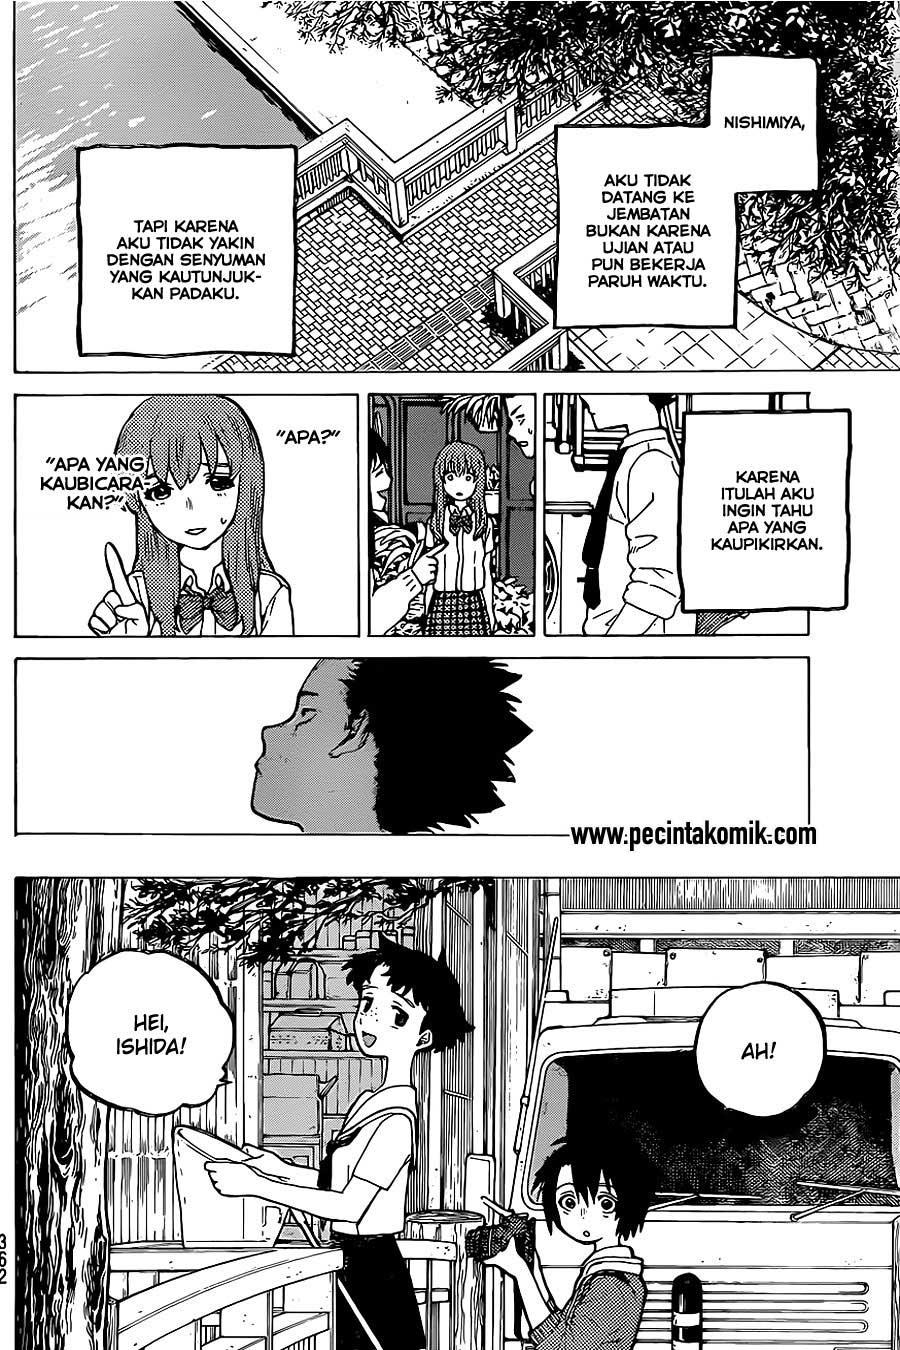 Koe no Katachi Chapter 22-17